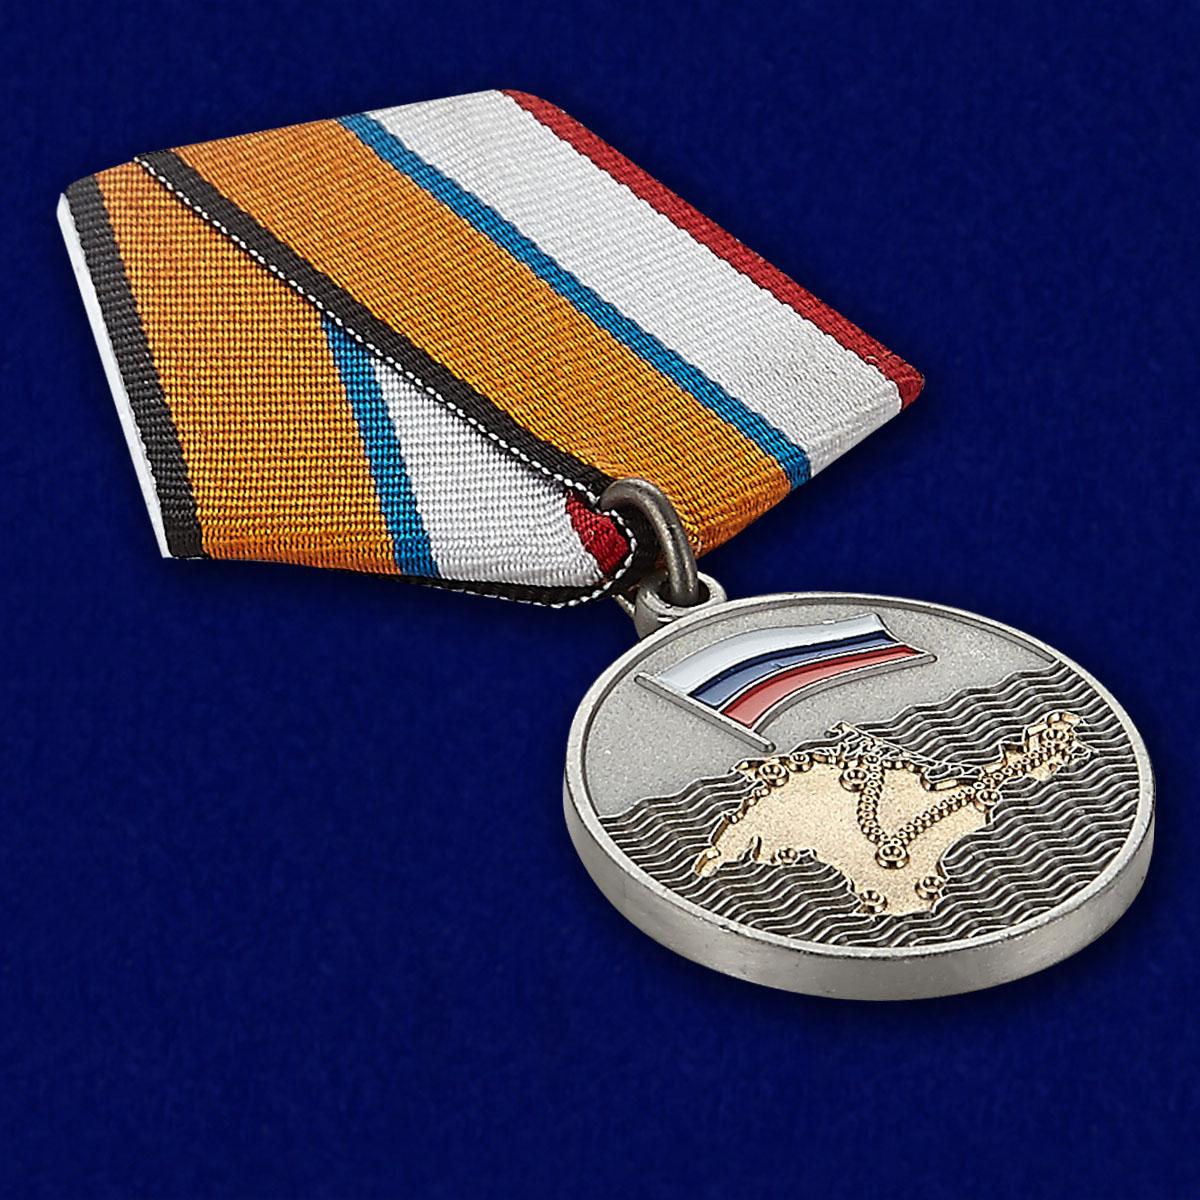 Медали за возвращение Крыма